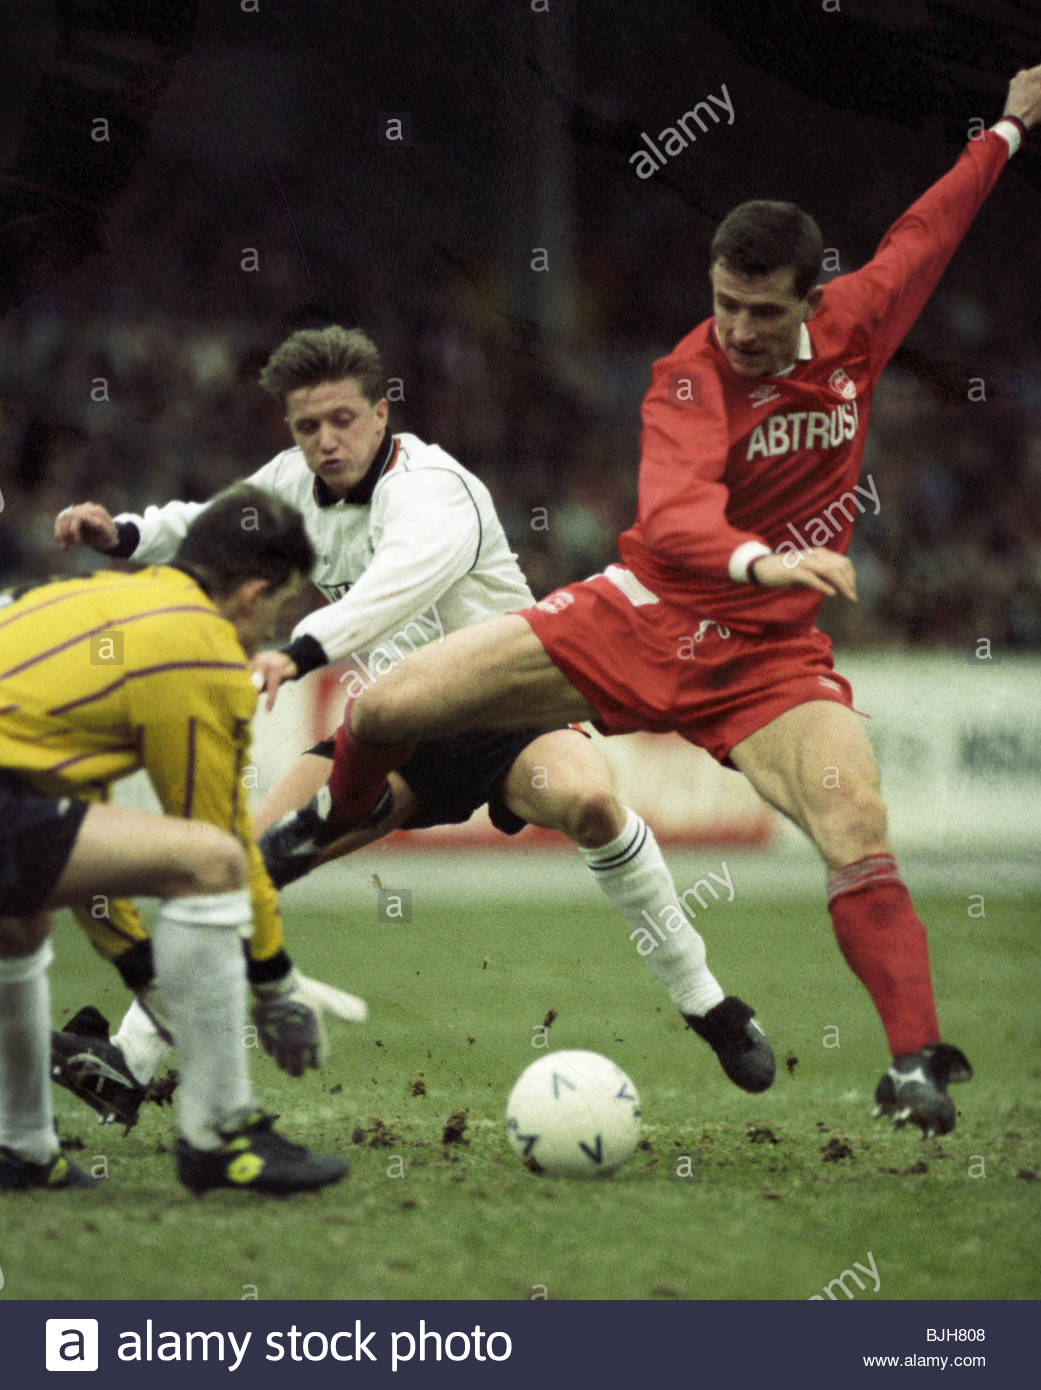 07/02/93 TENNENT'S SCOTTISH CUP ABERDEEN v DUNDEE UTD (2-0) PITTODRIE - ABERDEEN Aberdeen star Brian Irvine - Stock Image